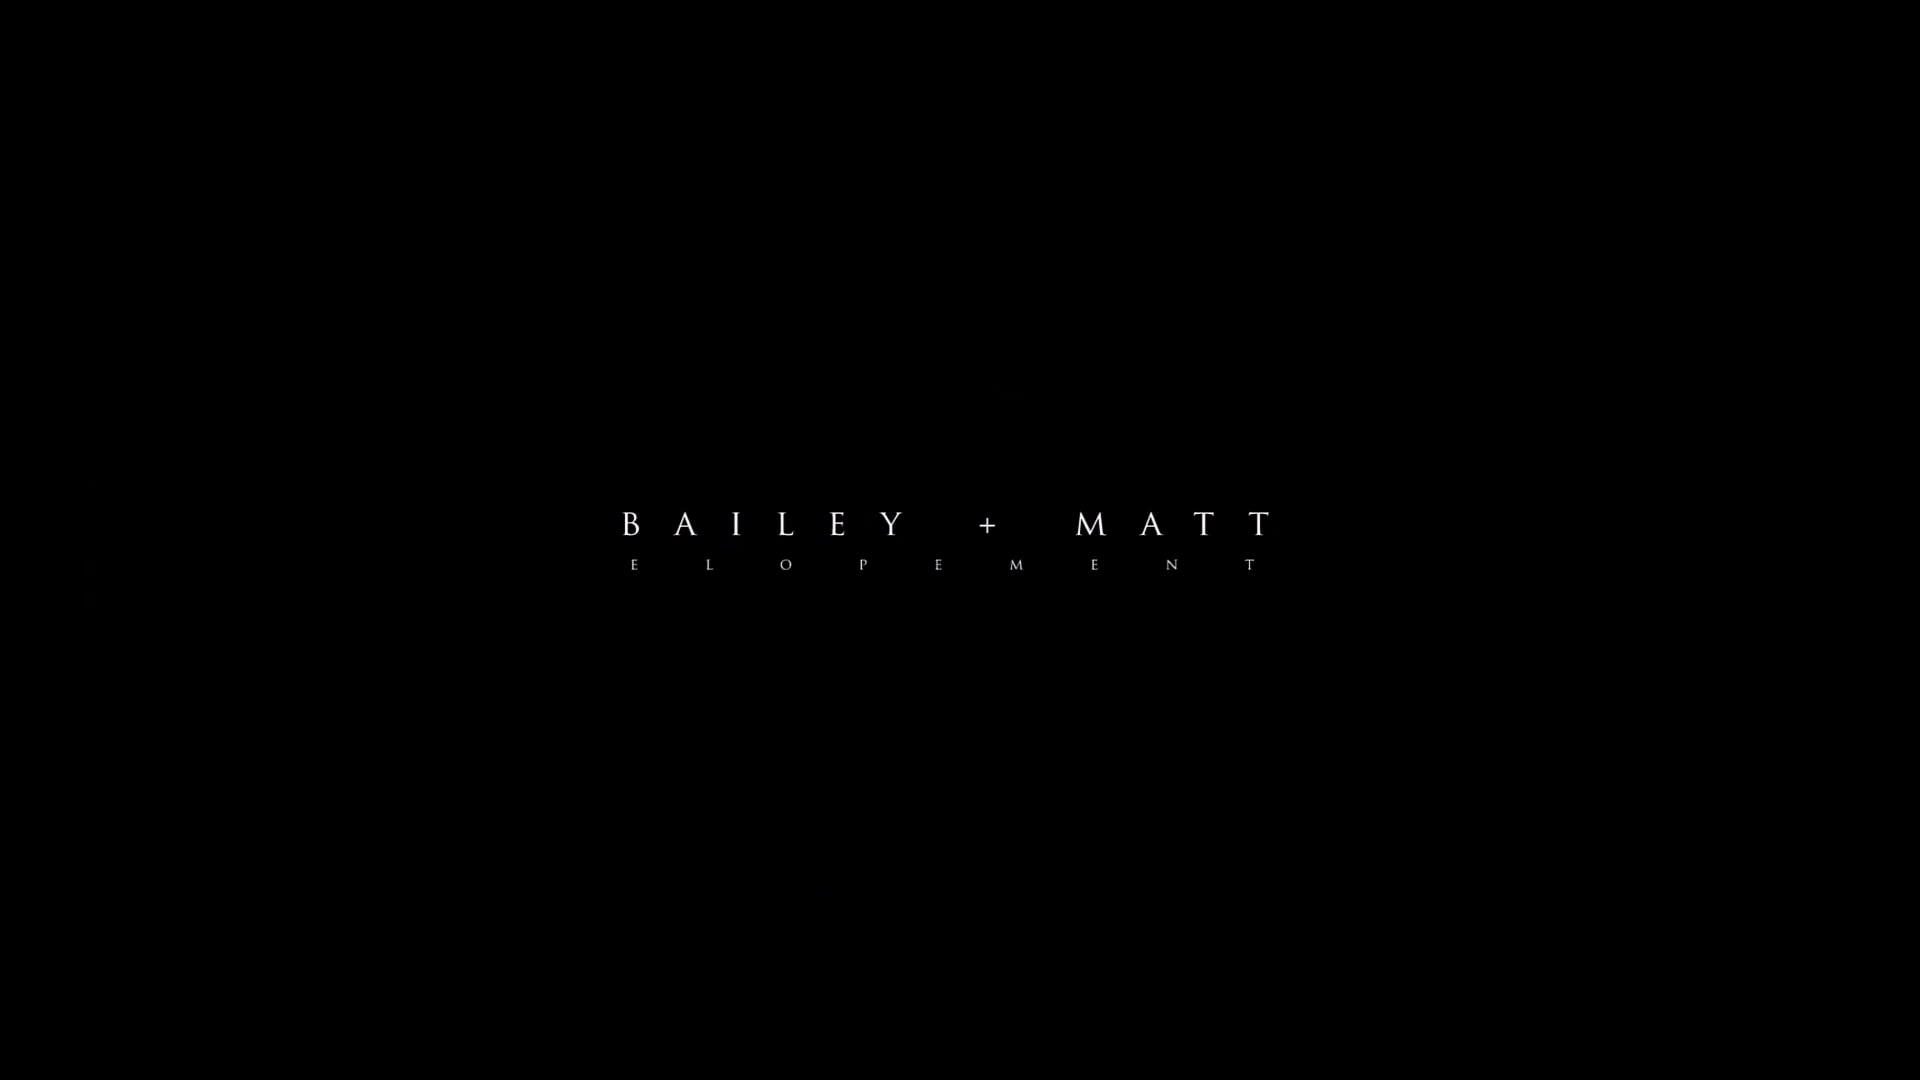 'Elopement' Trailer